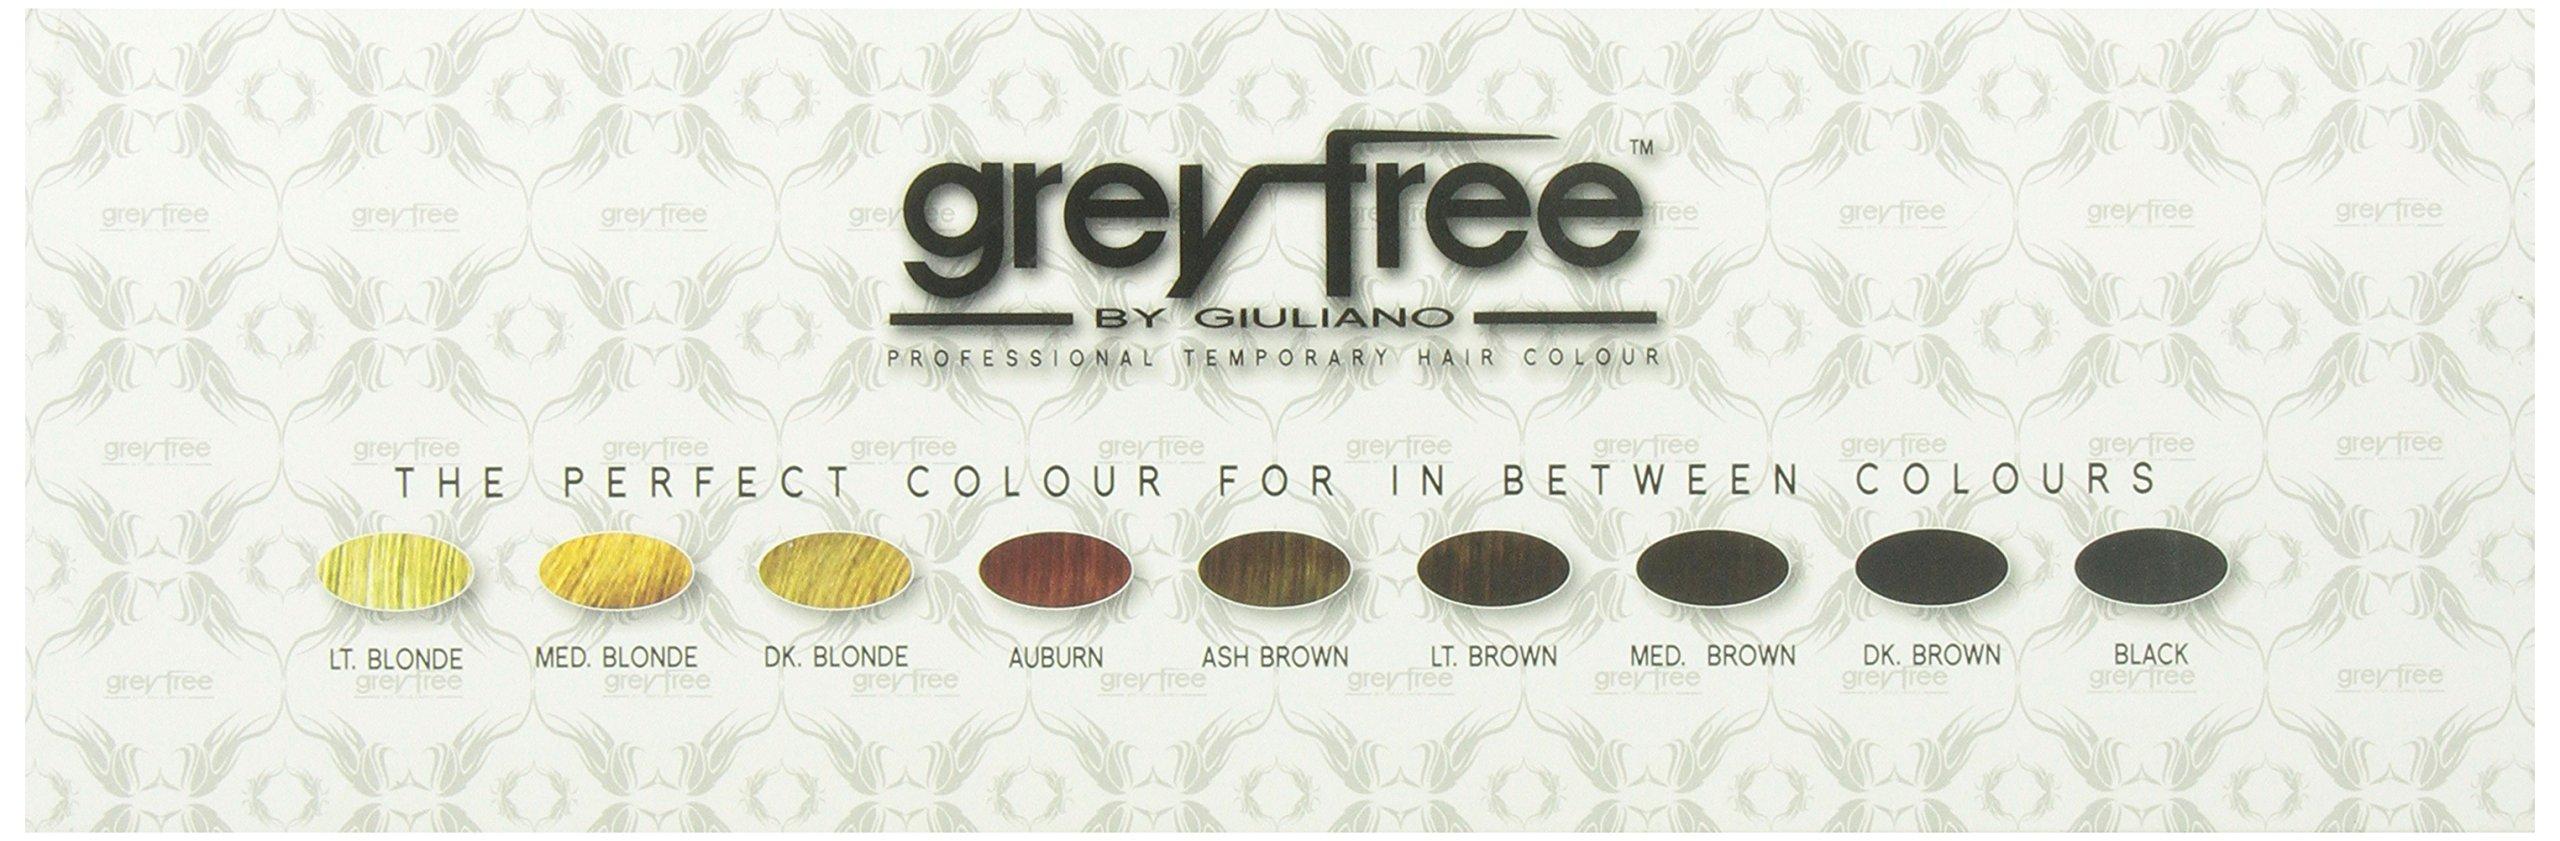 Greyfree Professional Temprorary Hair Color 18 Pieces Display by Greyfree (Image #4)